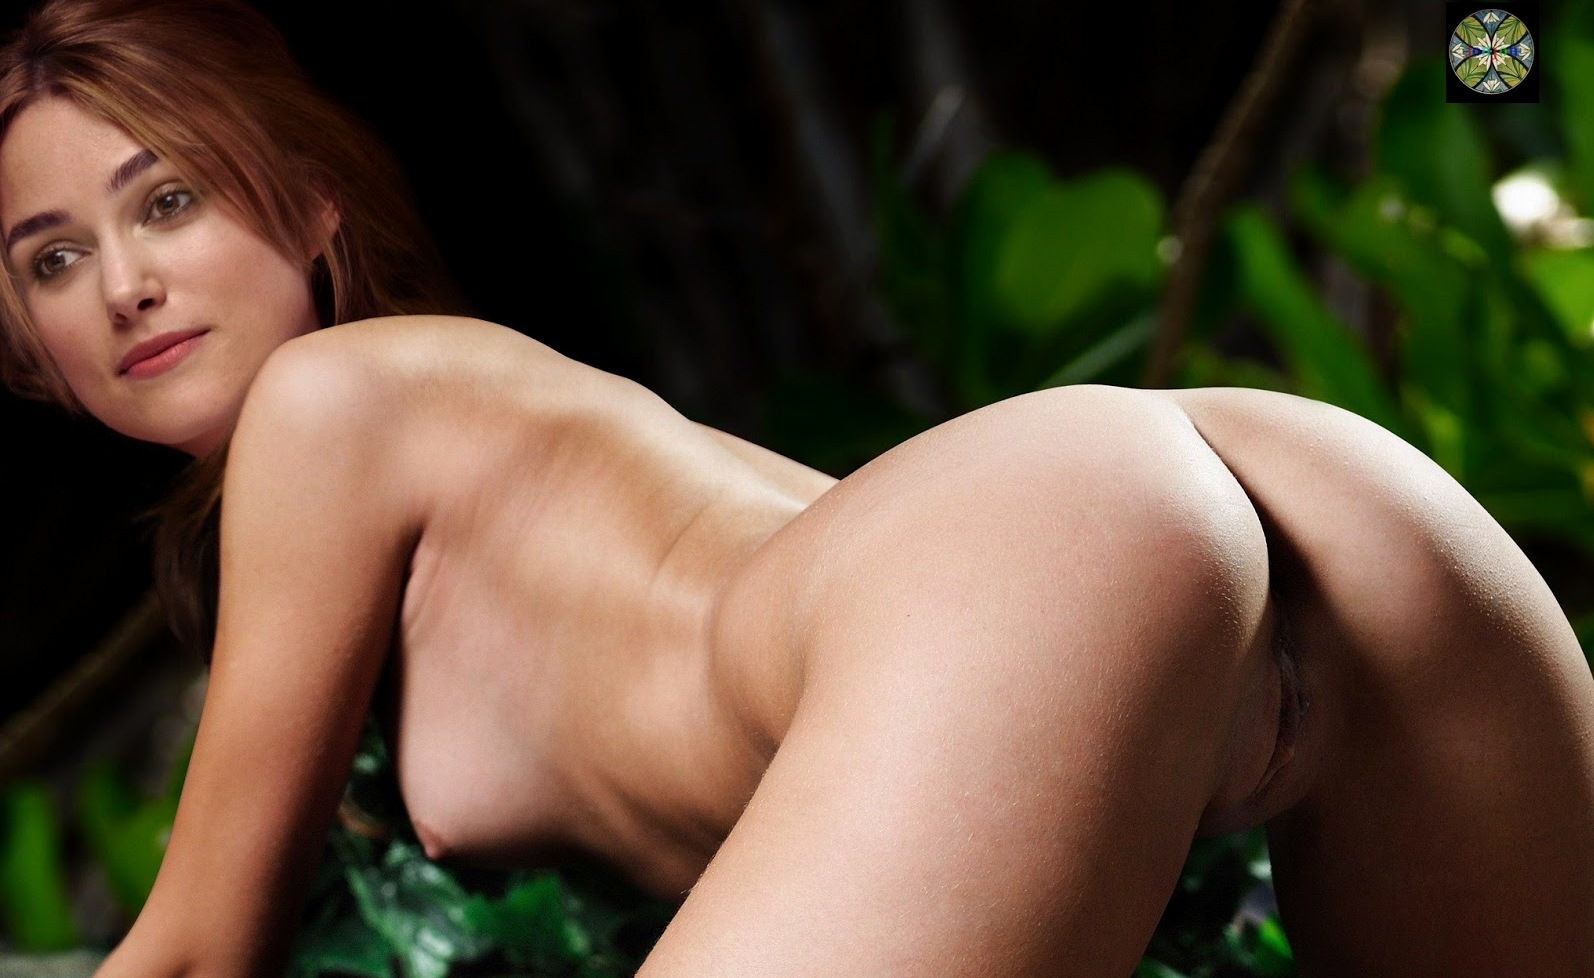 Keira knightley porn naked, ebony dicks in white chicks